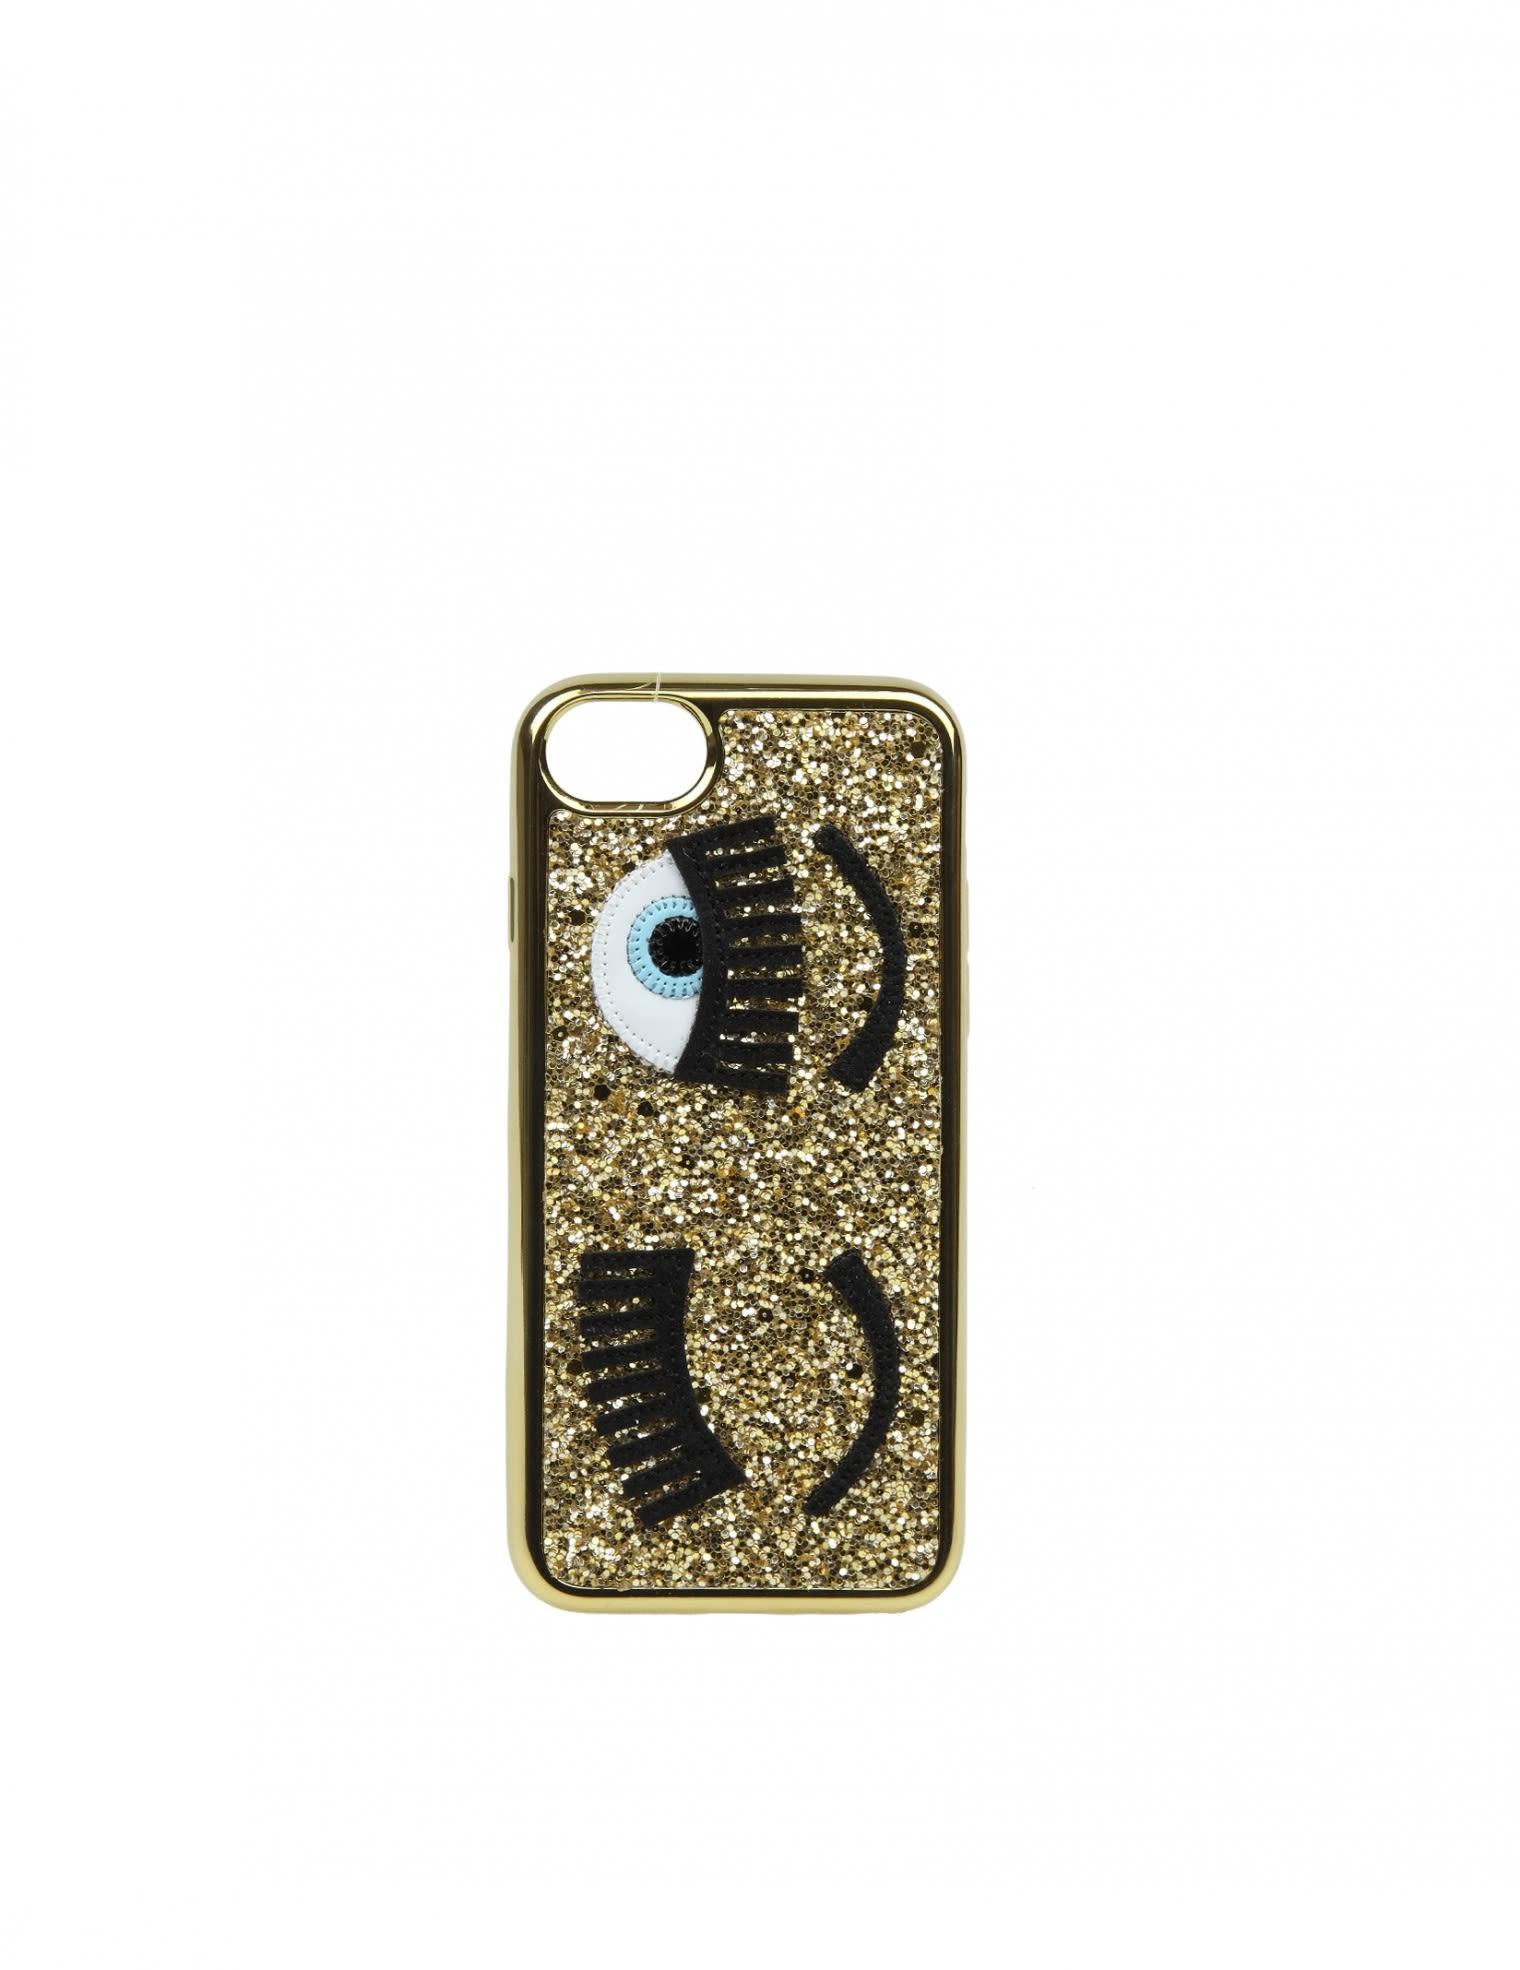 Chiara Ferragni Iphone Cover S6-s7 flirting